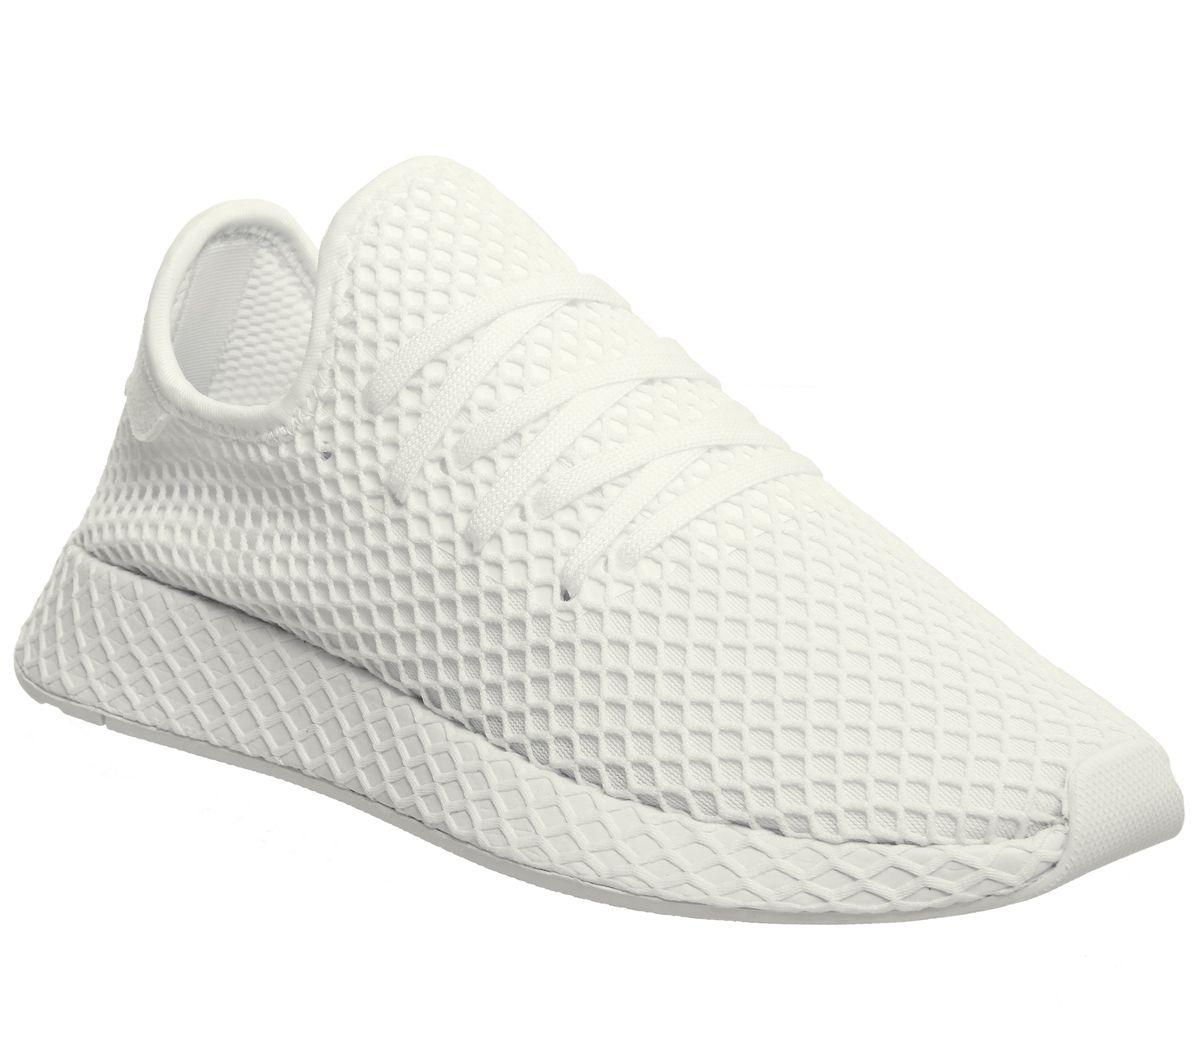 d26b0a8cc1103 adidas Deerupt Trainers White White White - Unisex Sports